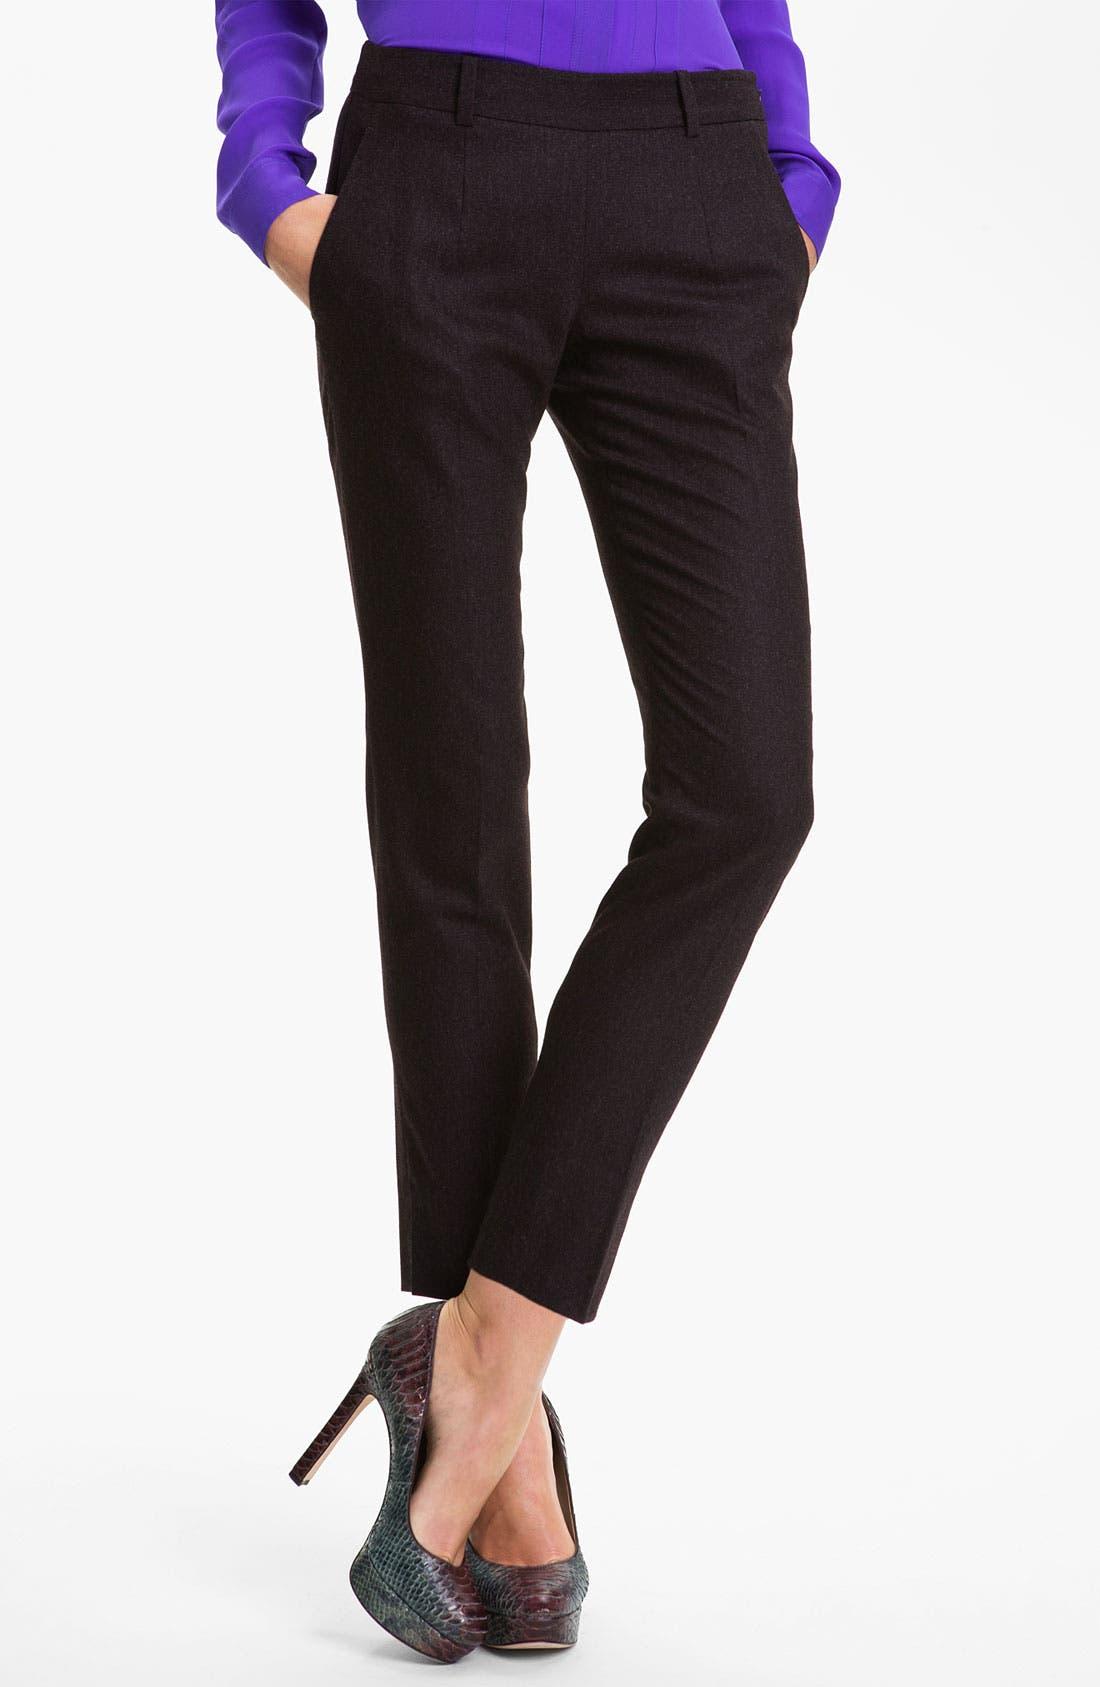 Alternate Image 1 Selected - Theory 'Bellisen' Slim Leg Ankle Pants